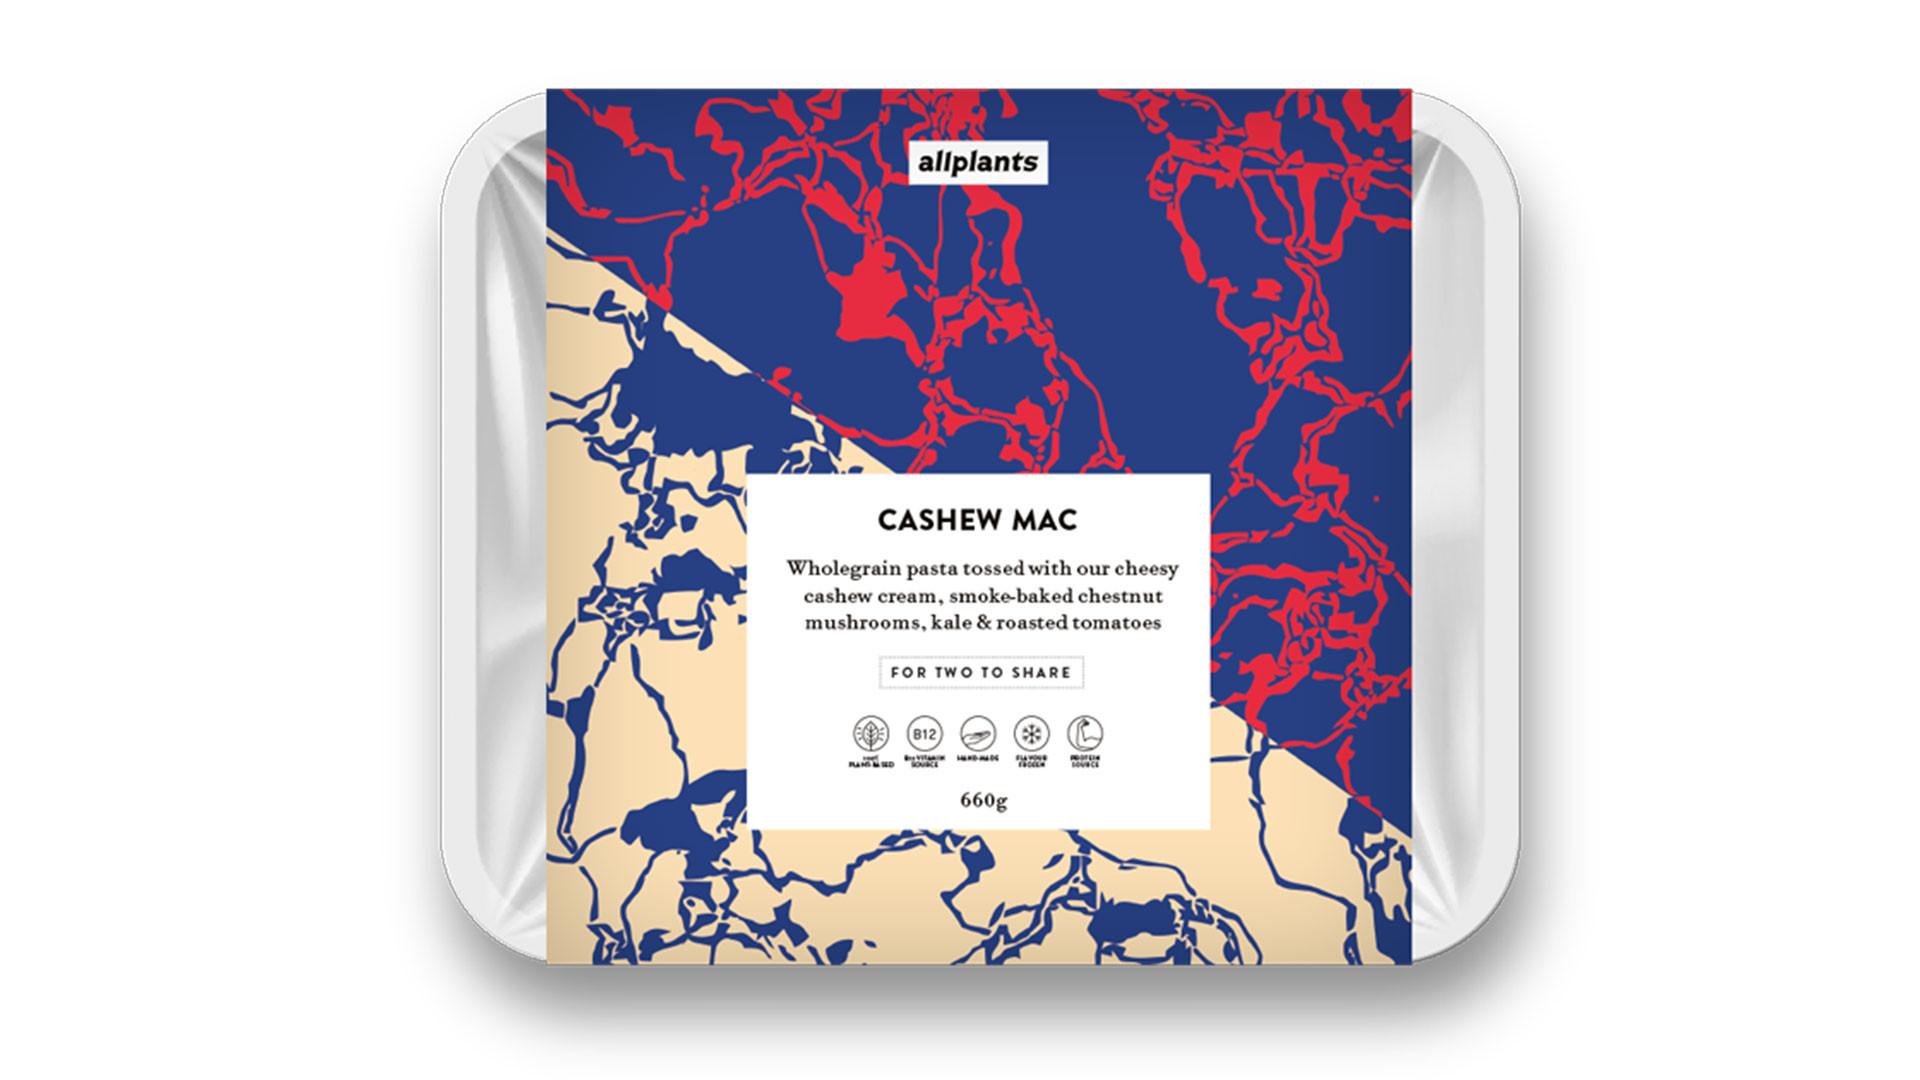 allplants cashew mac packaging